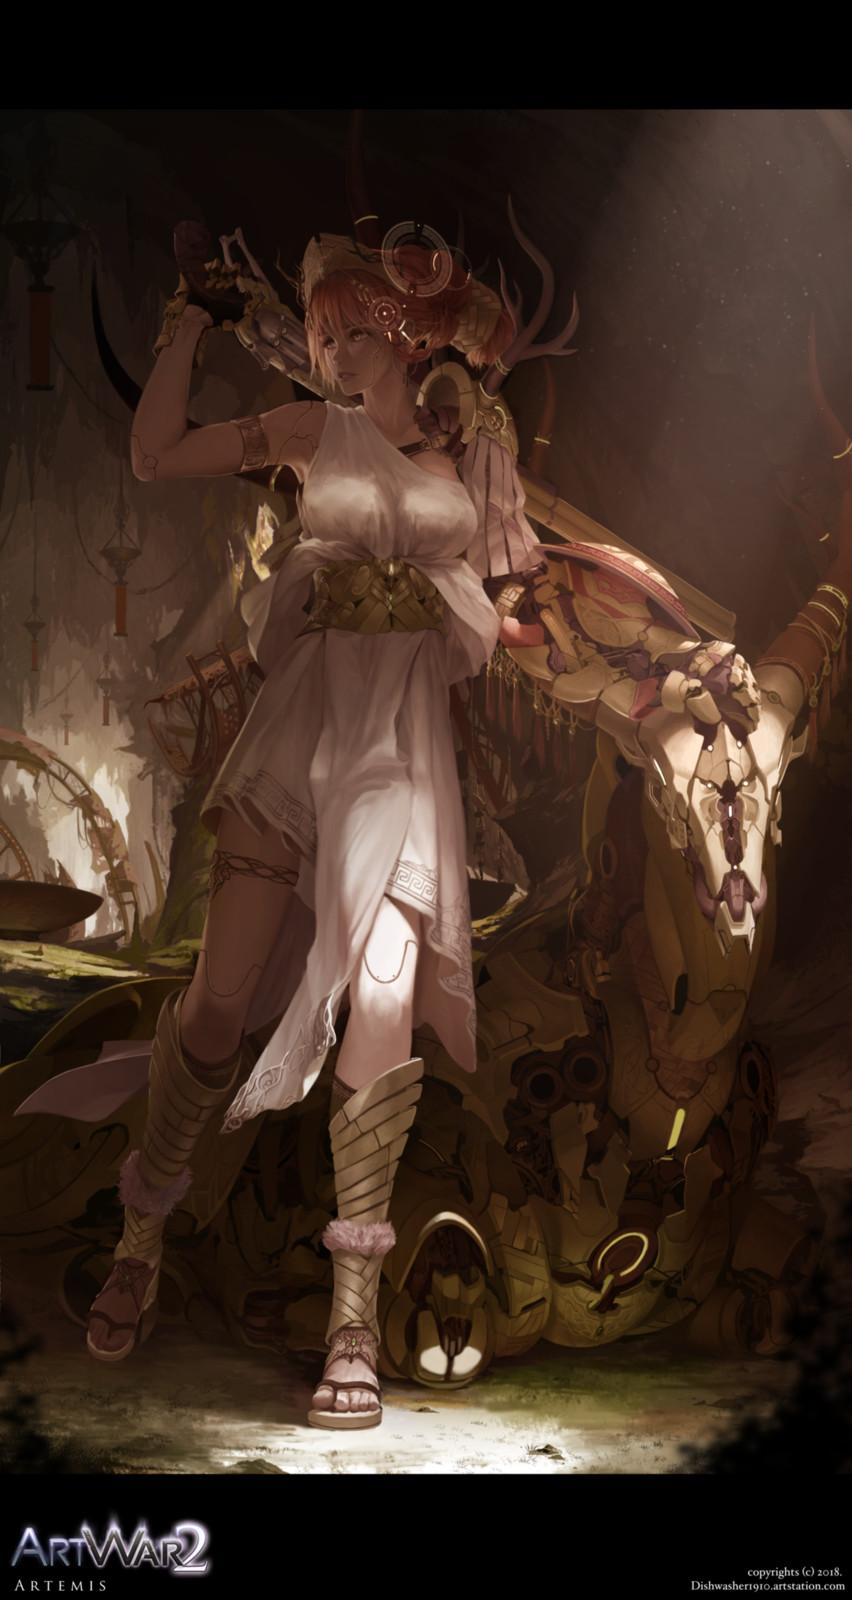 ARTWAR 2: Artemis